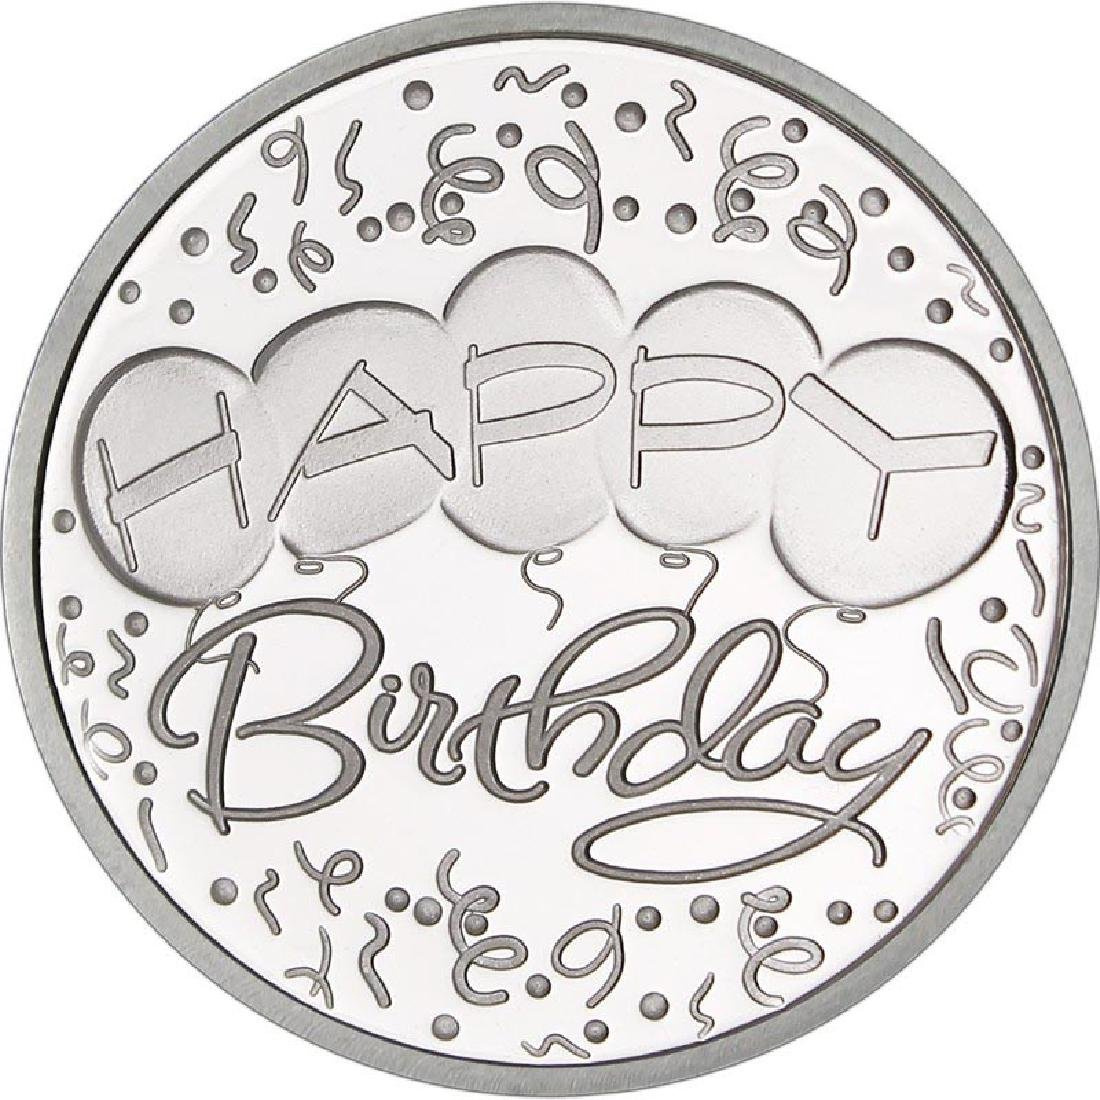 Happy Birthday Balloons .999 Silver 1 oz Round